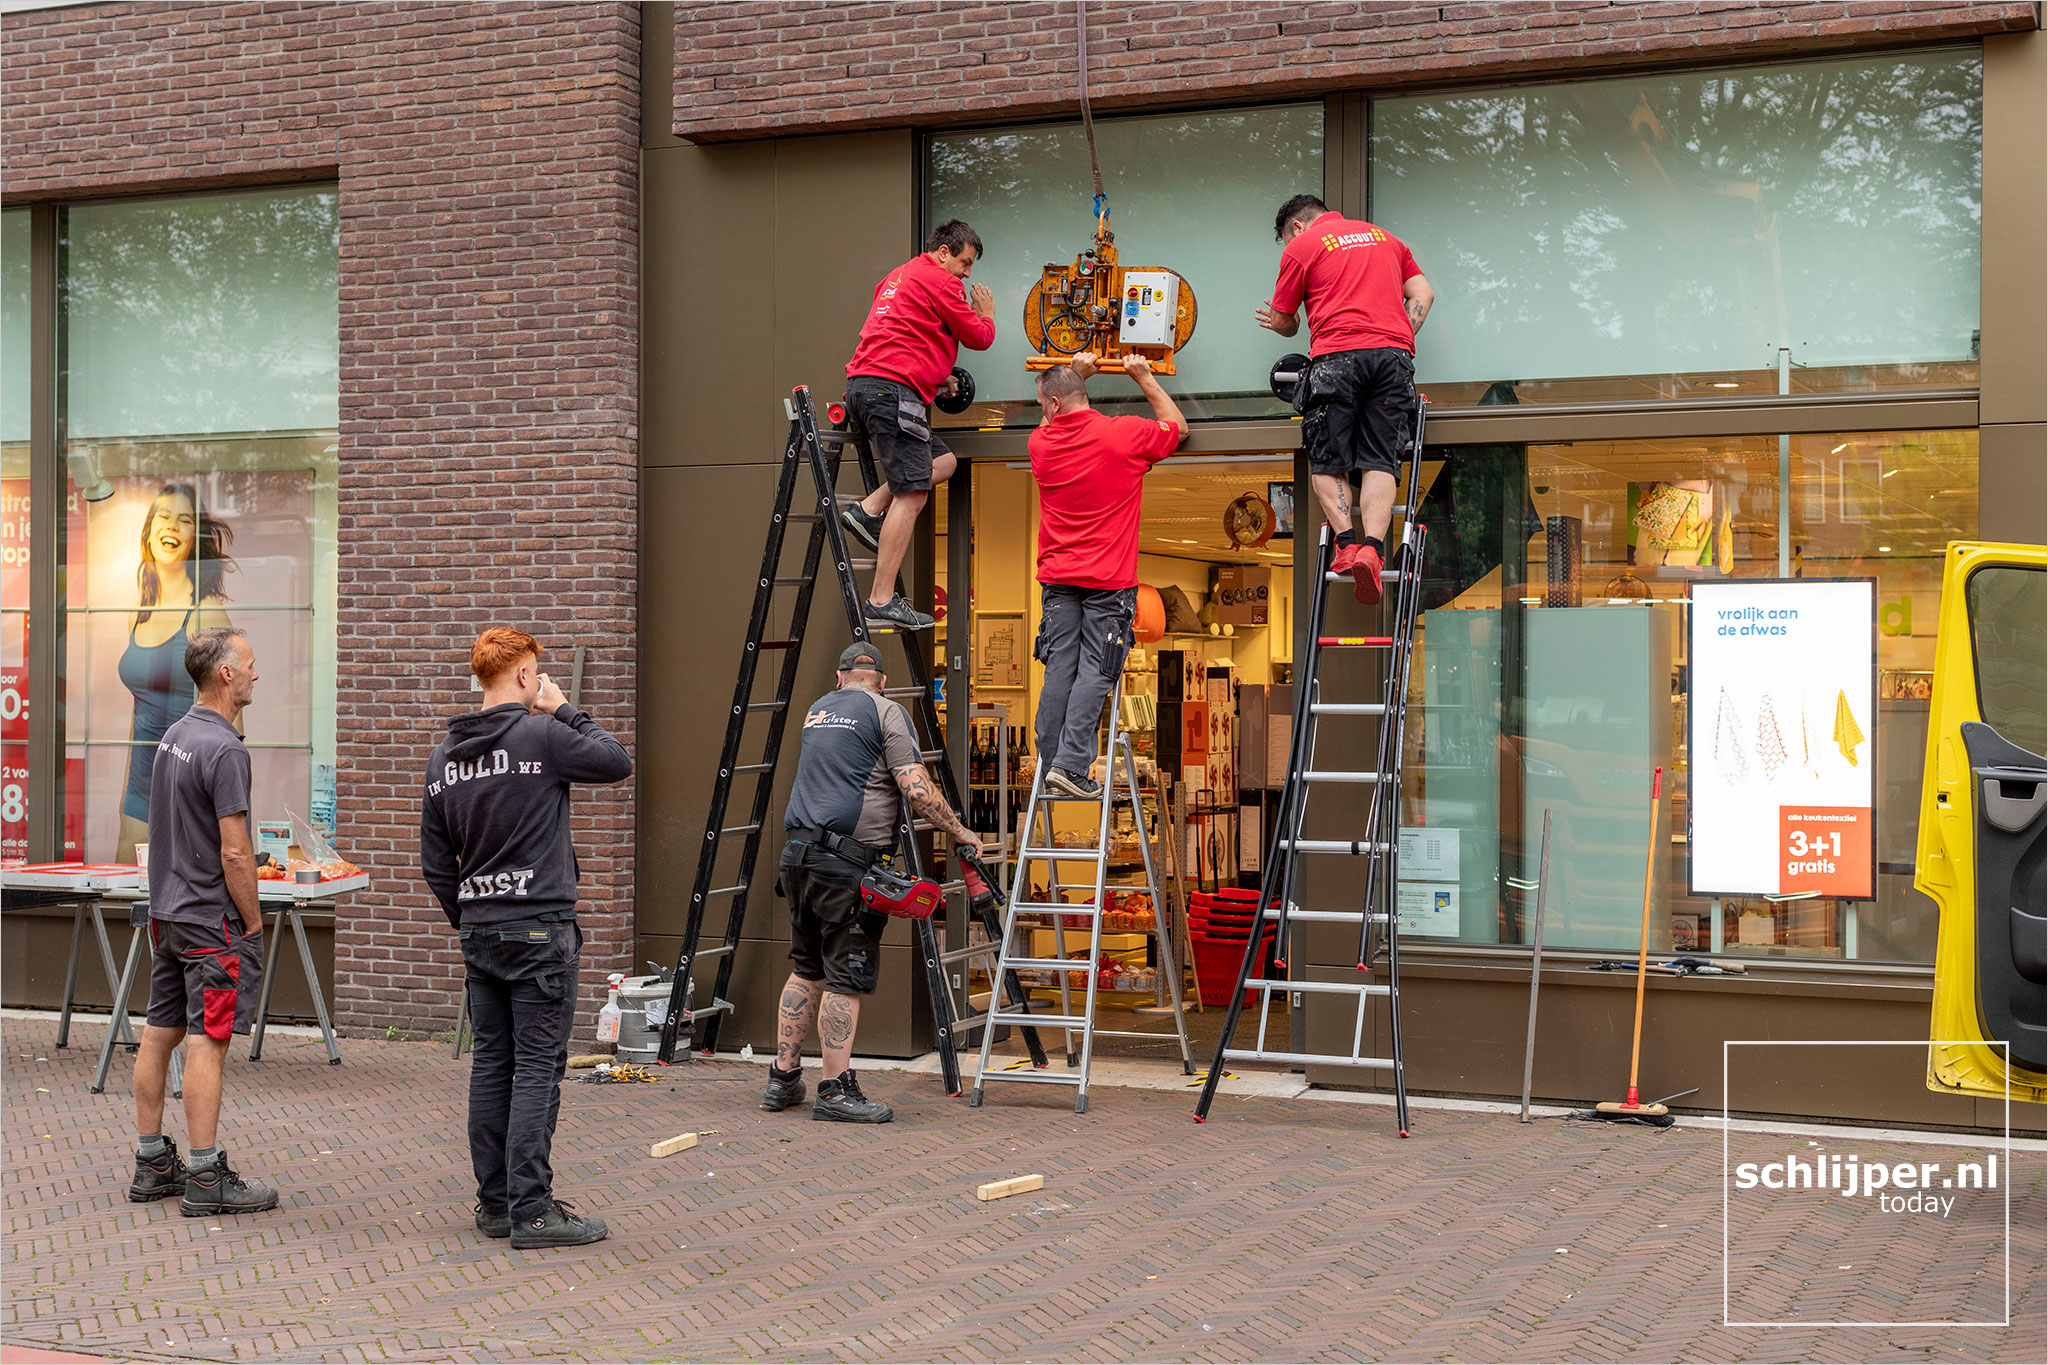 The Netherlands, Amsterdam, 15 juli 2021